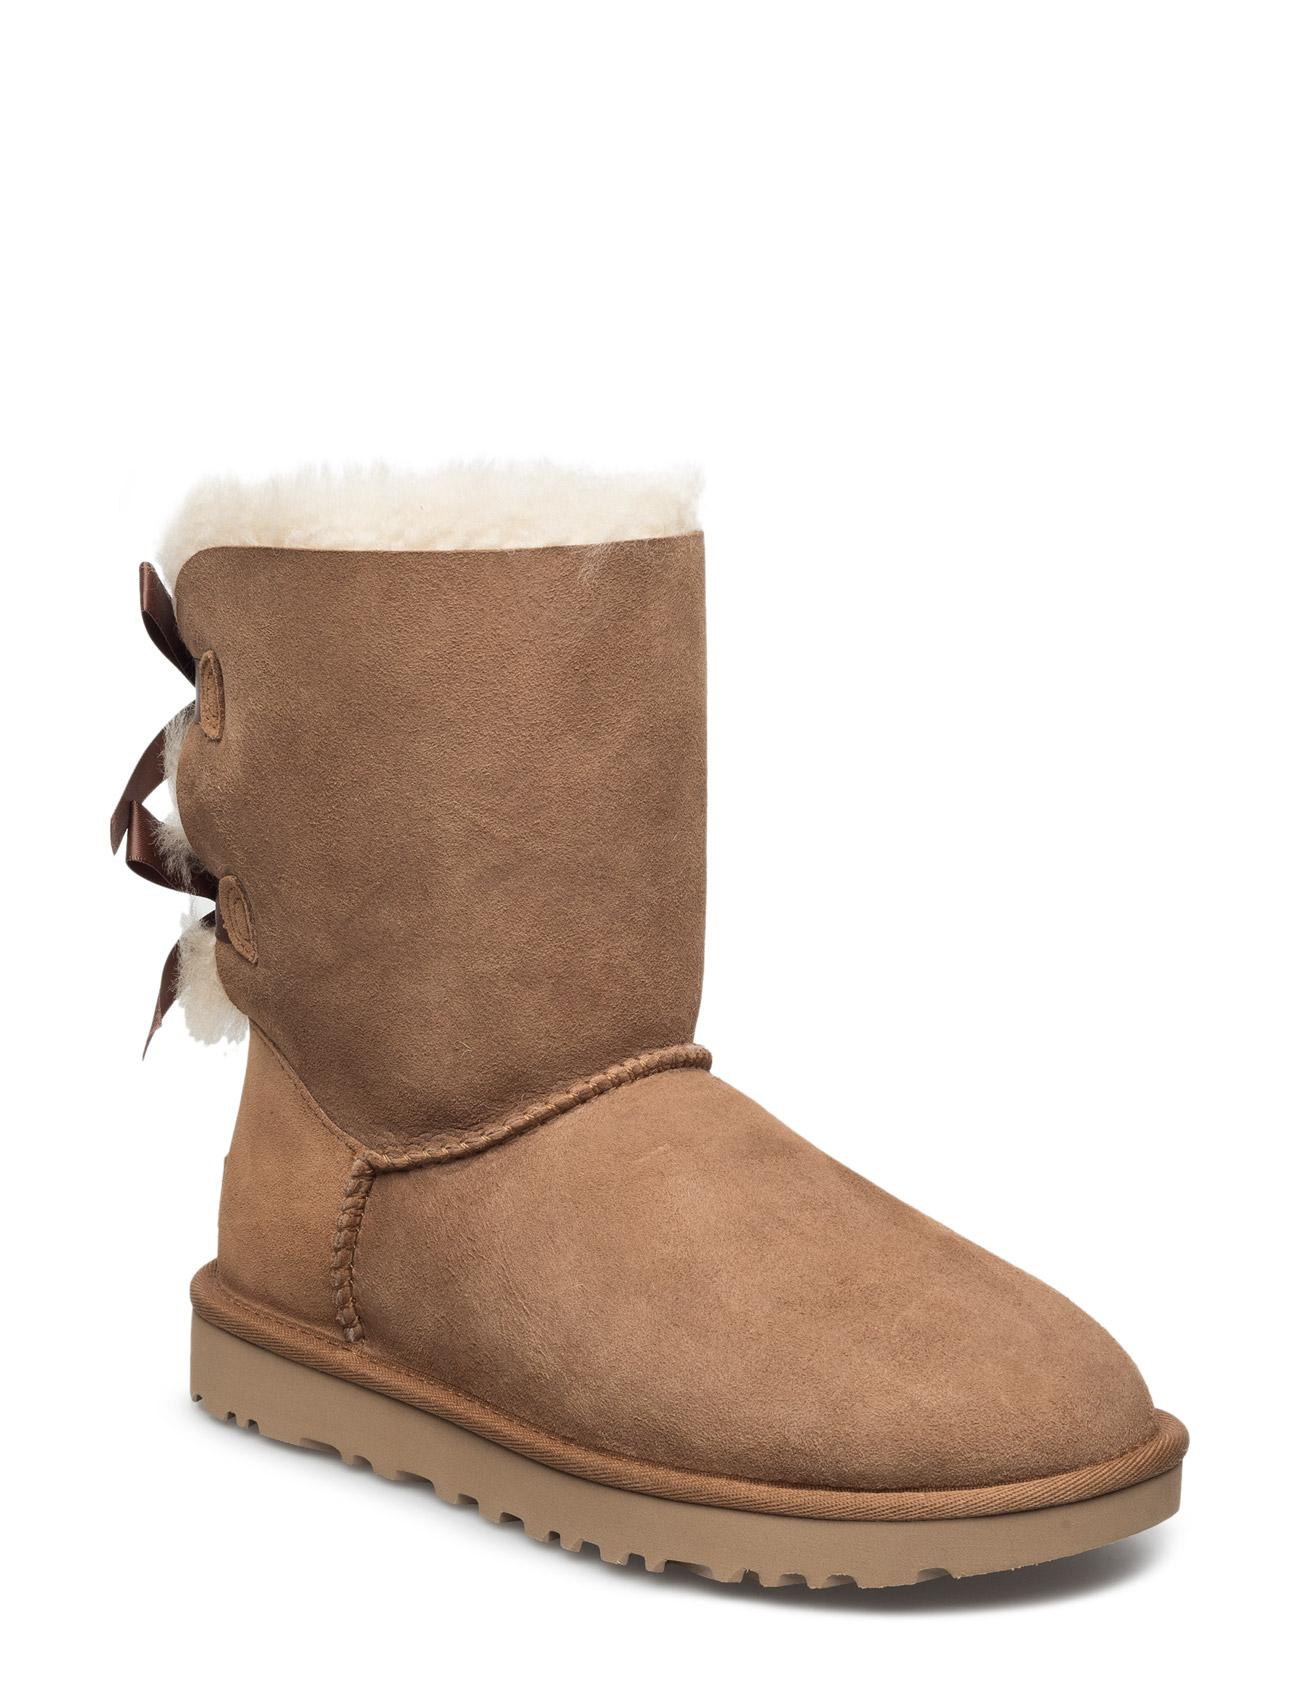 W Bailey Bow Ii UGG Støvler til Damer i kastanje